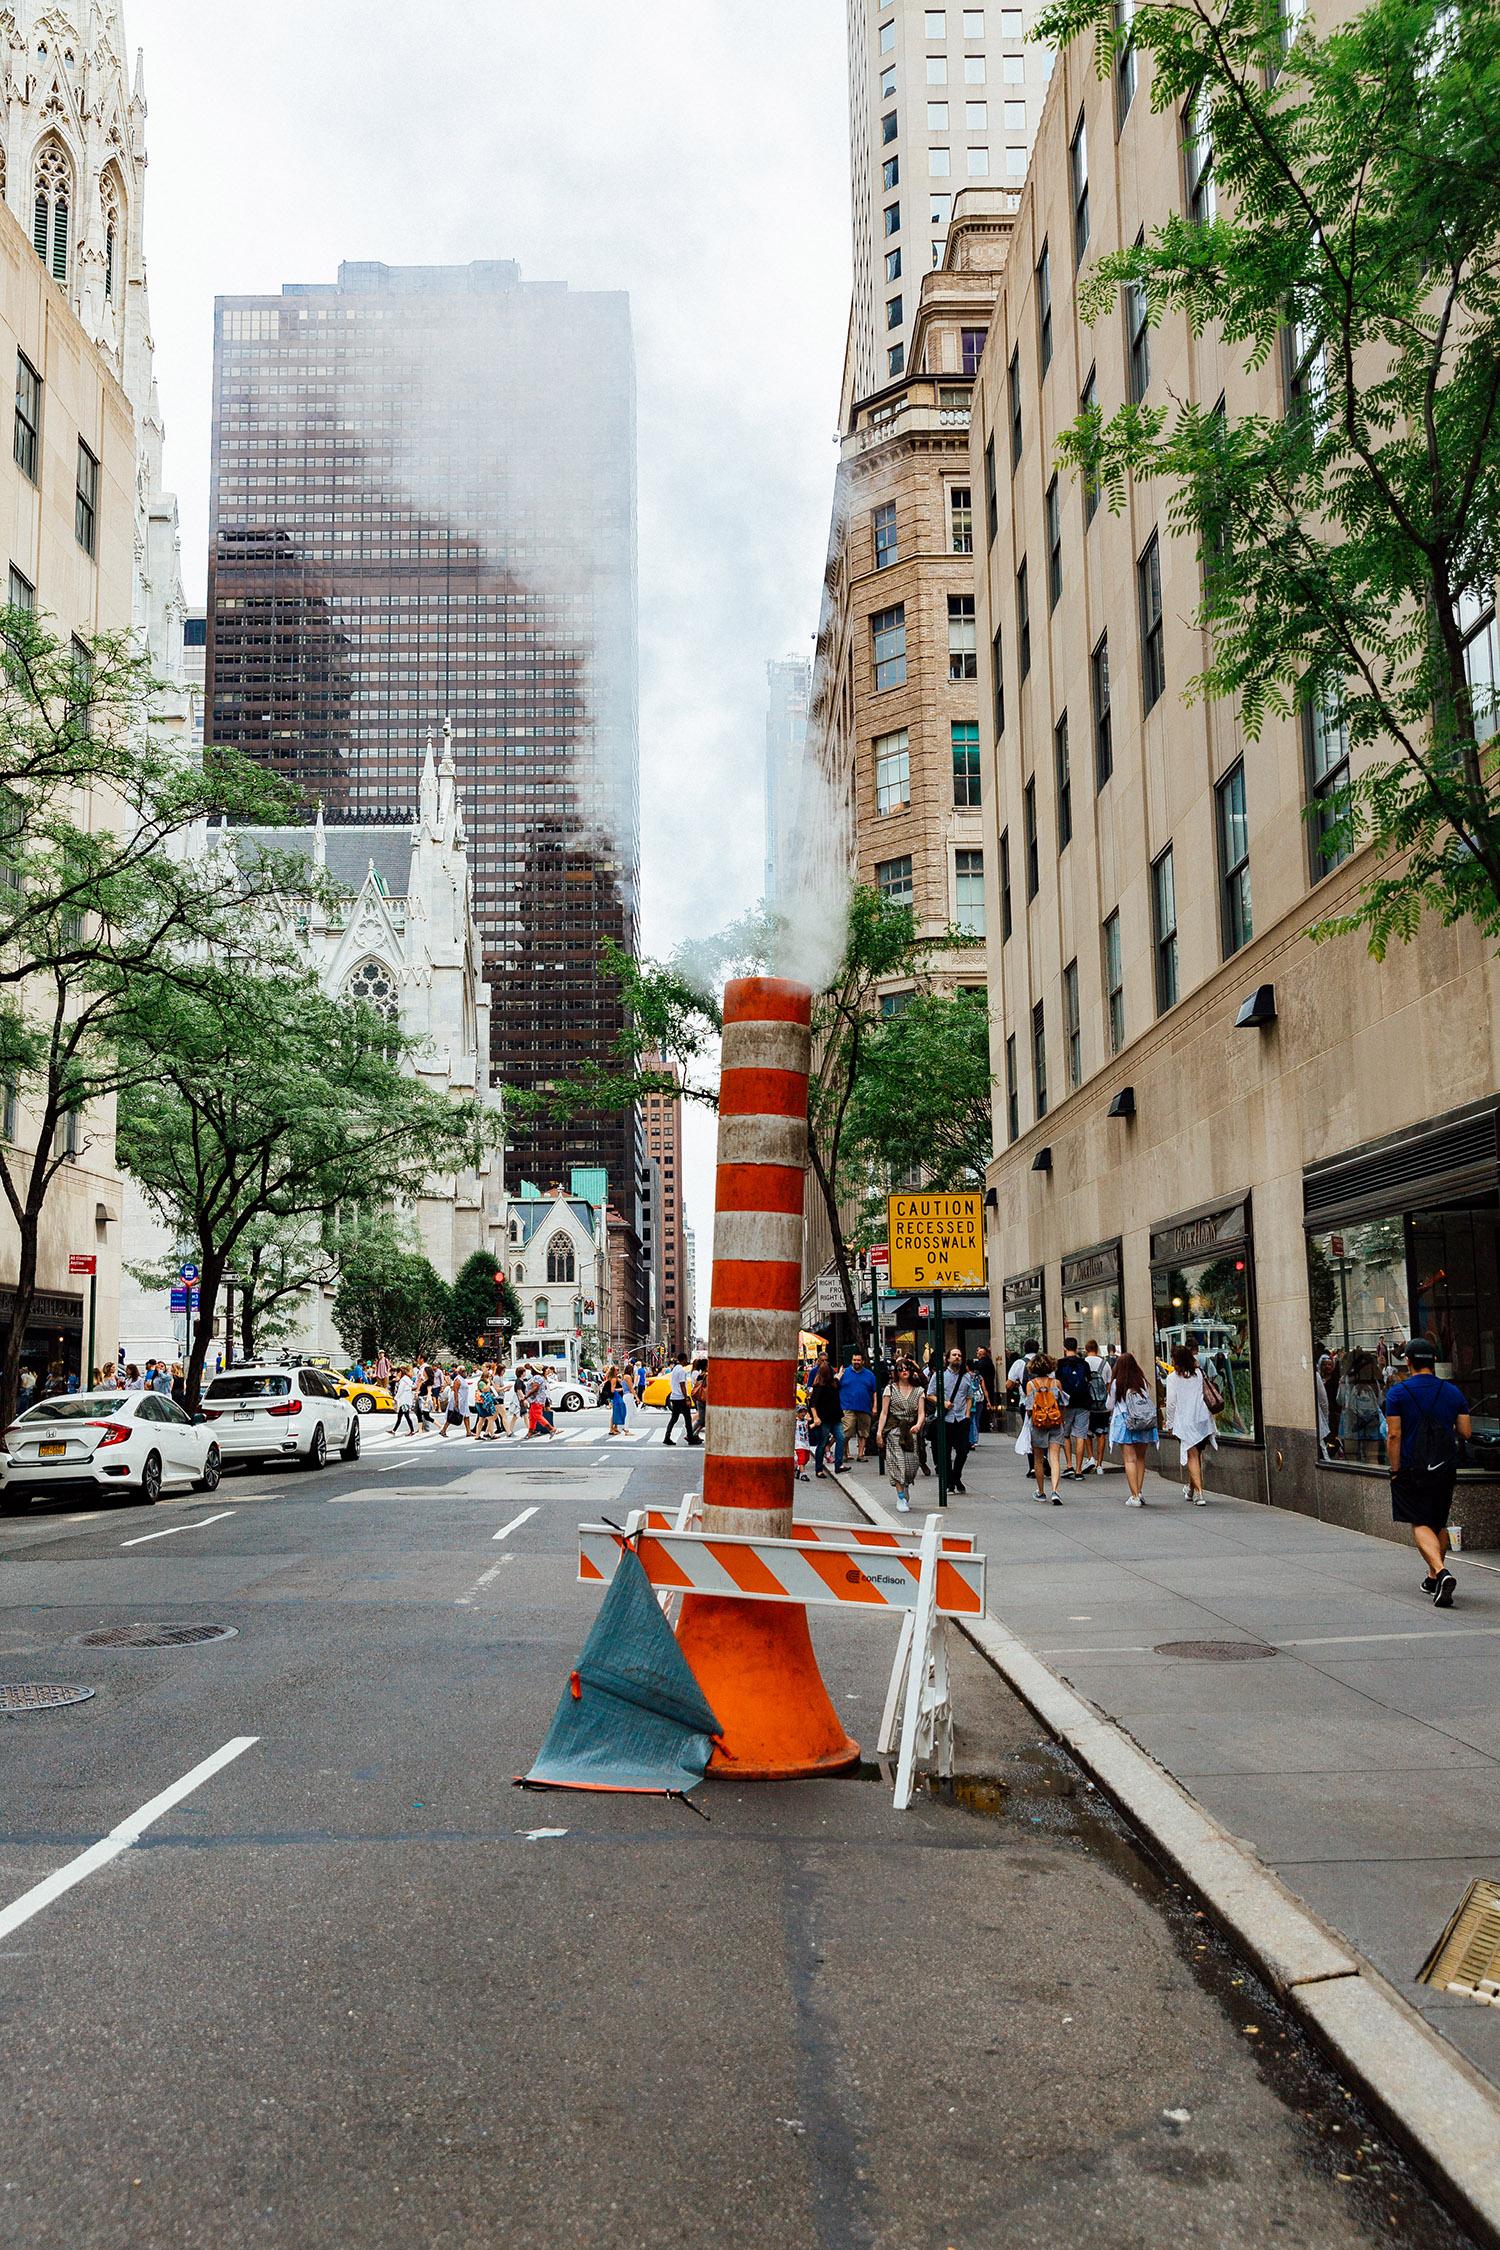 NYC_072018 (21 of 36).jpg